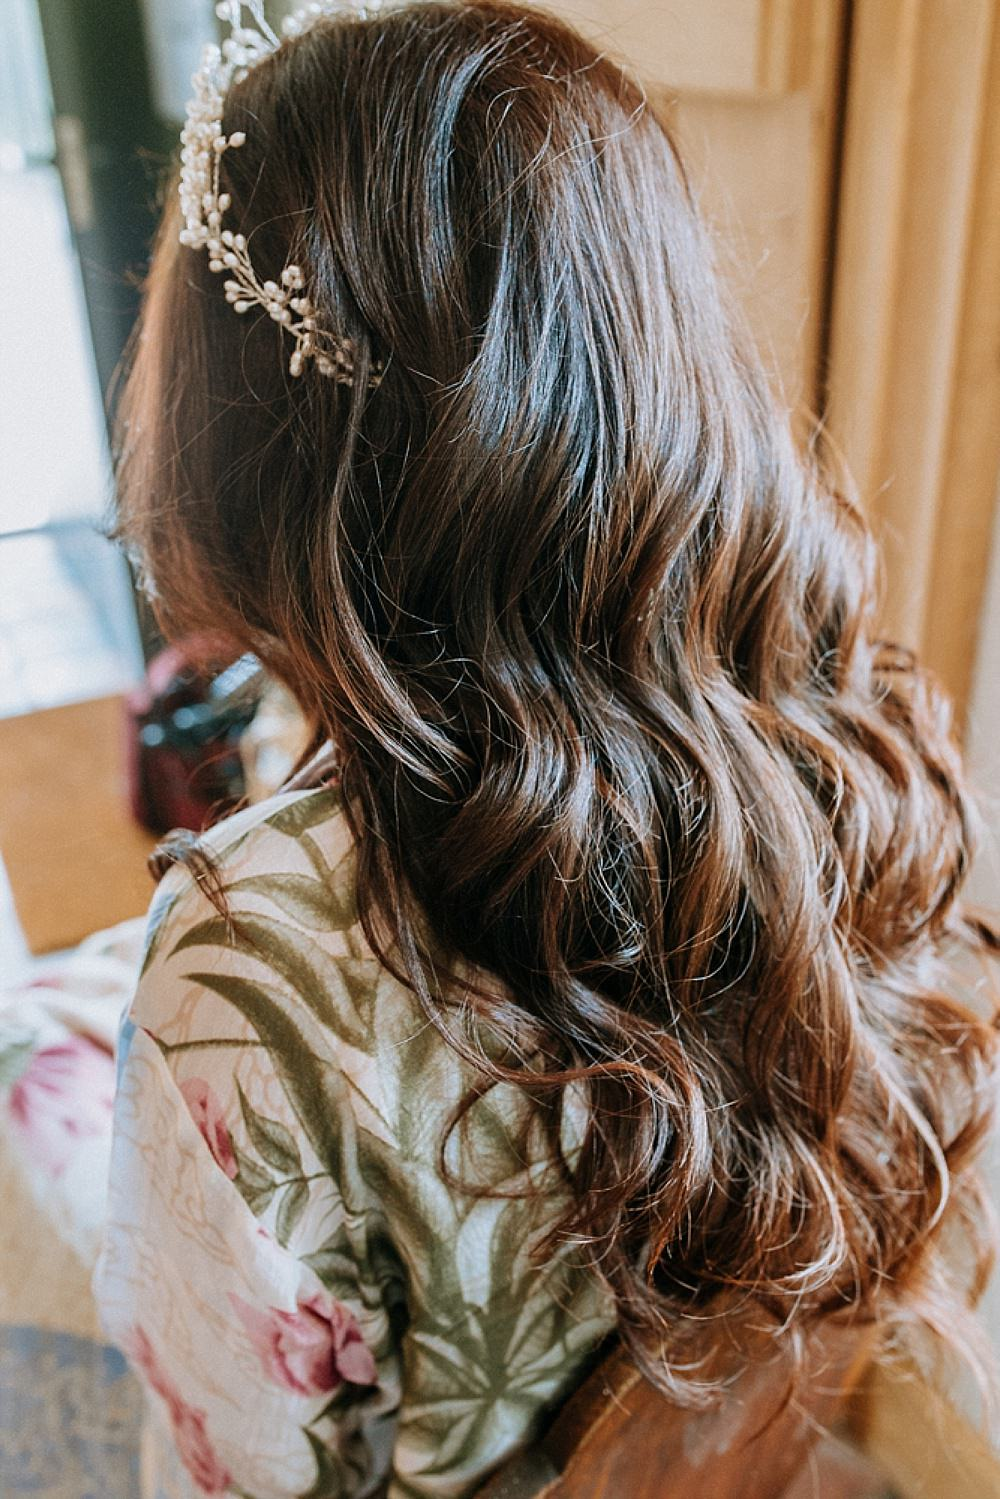 Headpiece Tiara Crown Accessory Bride Bridal Long Waves Hair Blue Gold Wedding Ideas Ailsa Reeve Photography